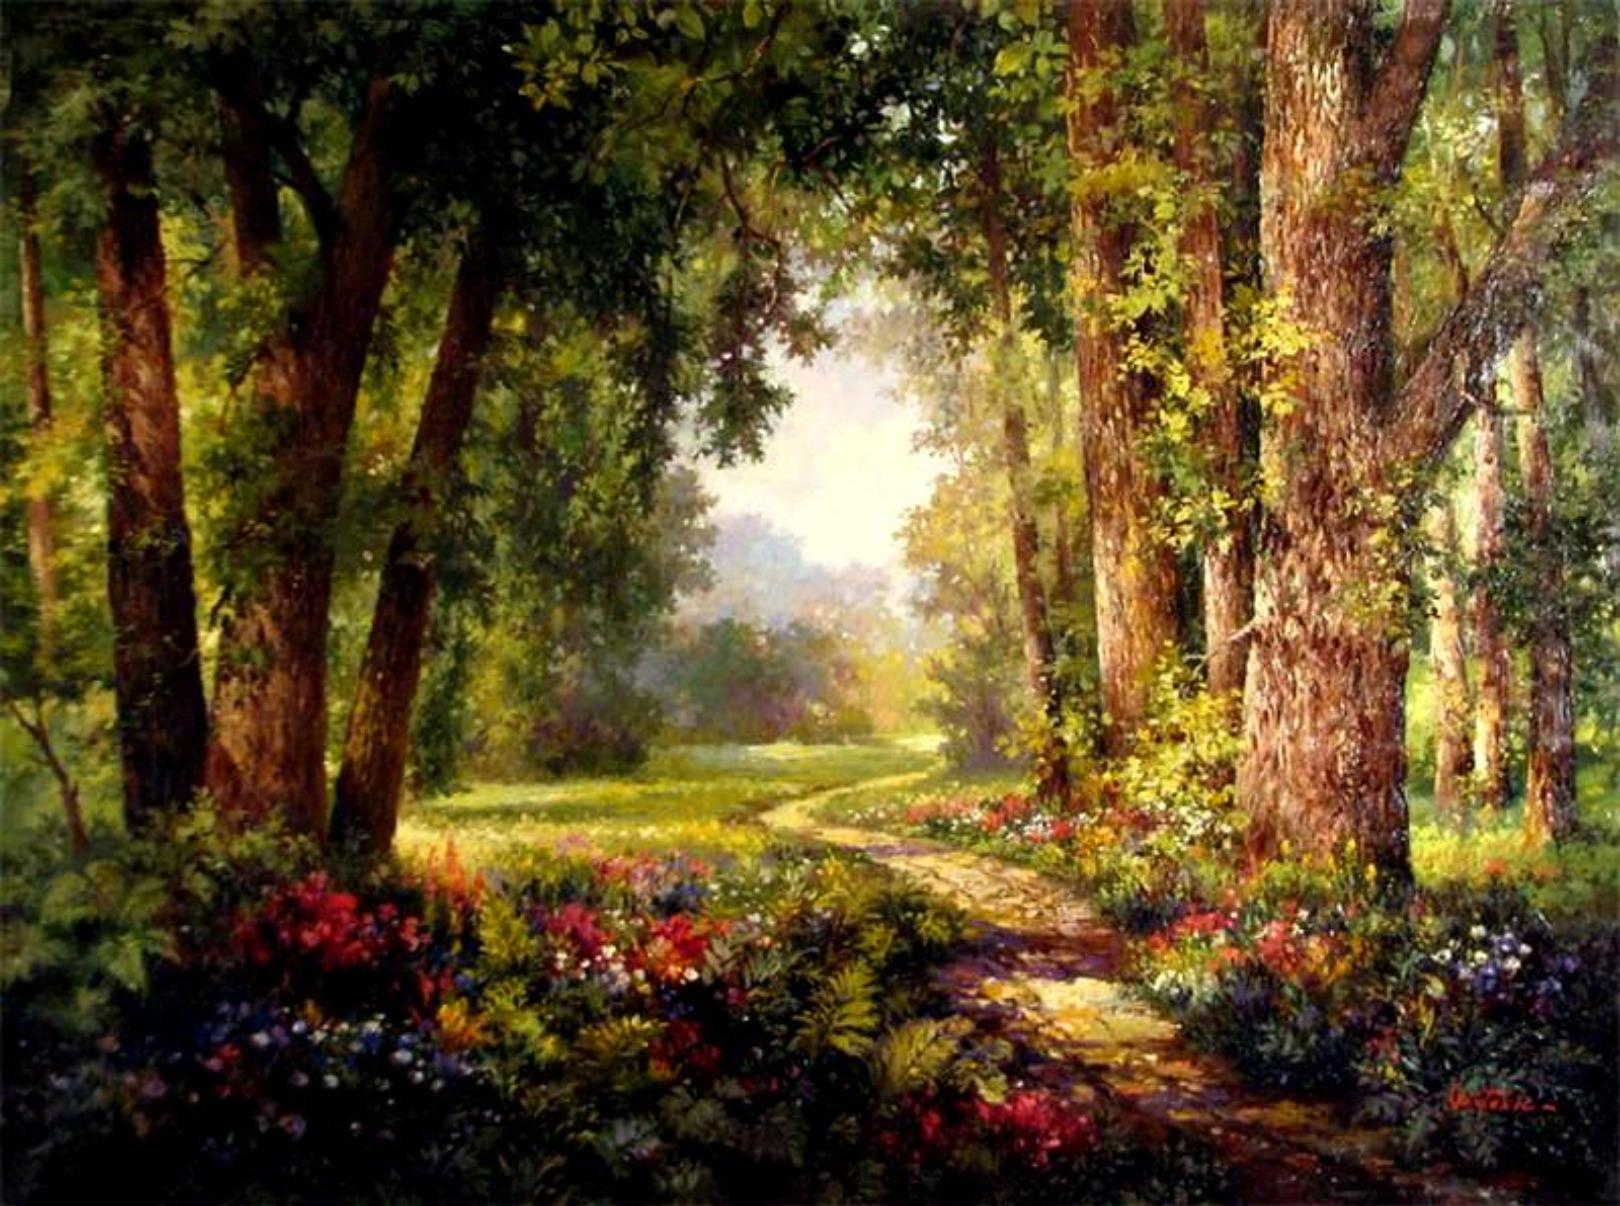 enchanted forest background - photo #35